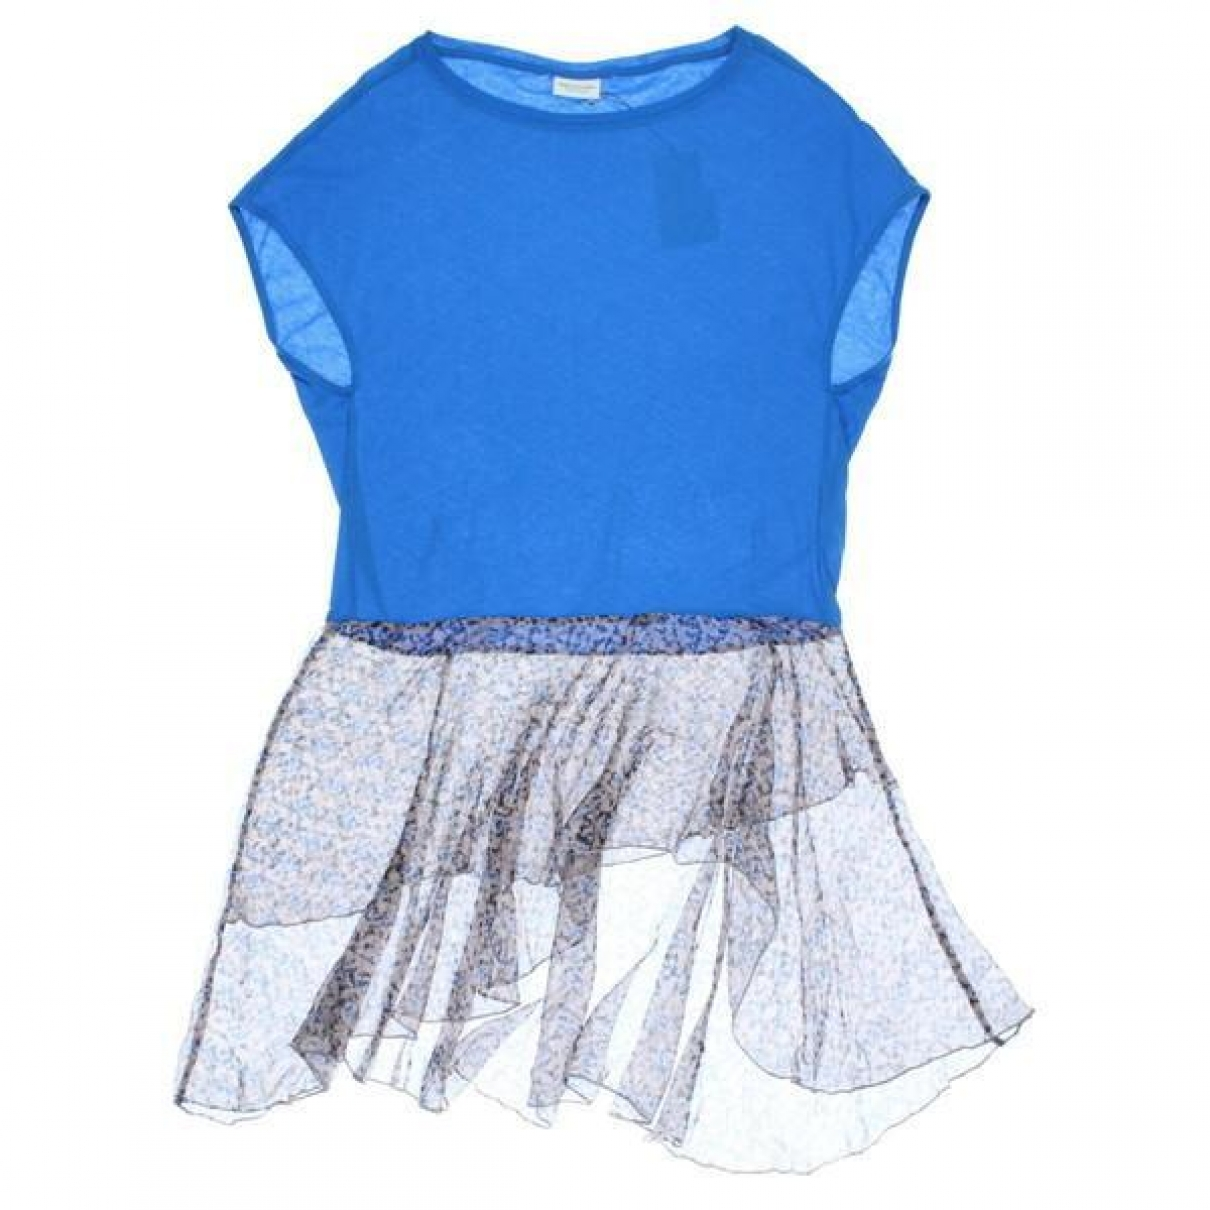 Dries Van Noten \N Blue Cotton jumpsuit for Women XS International